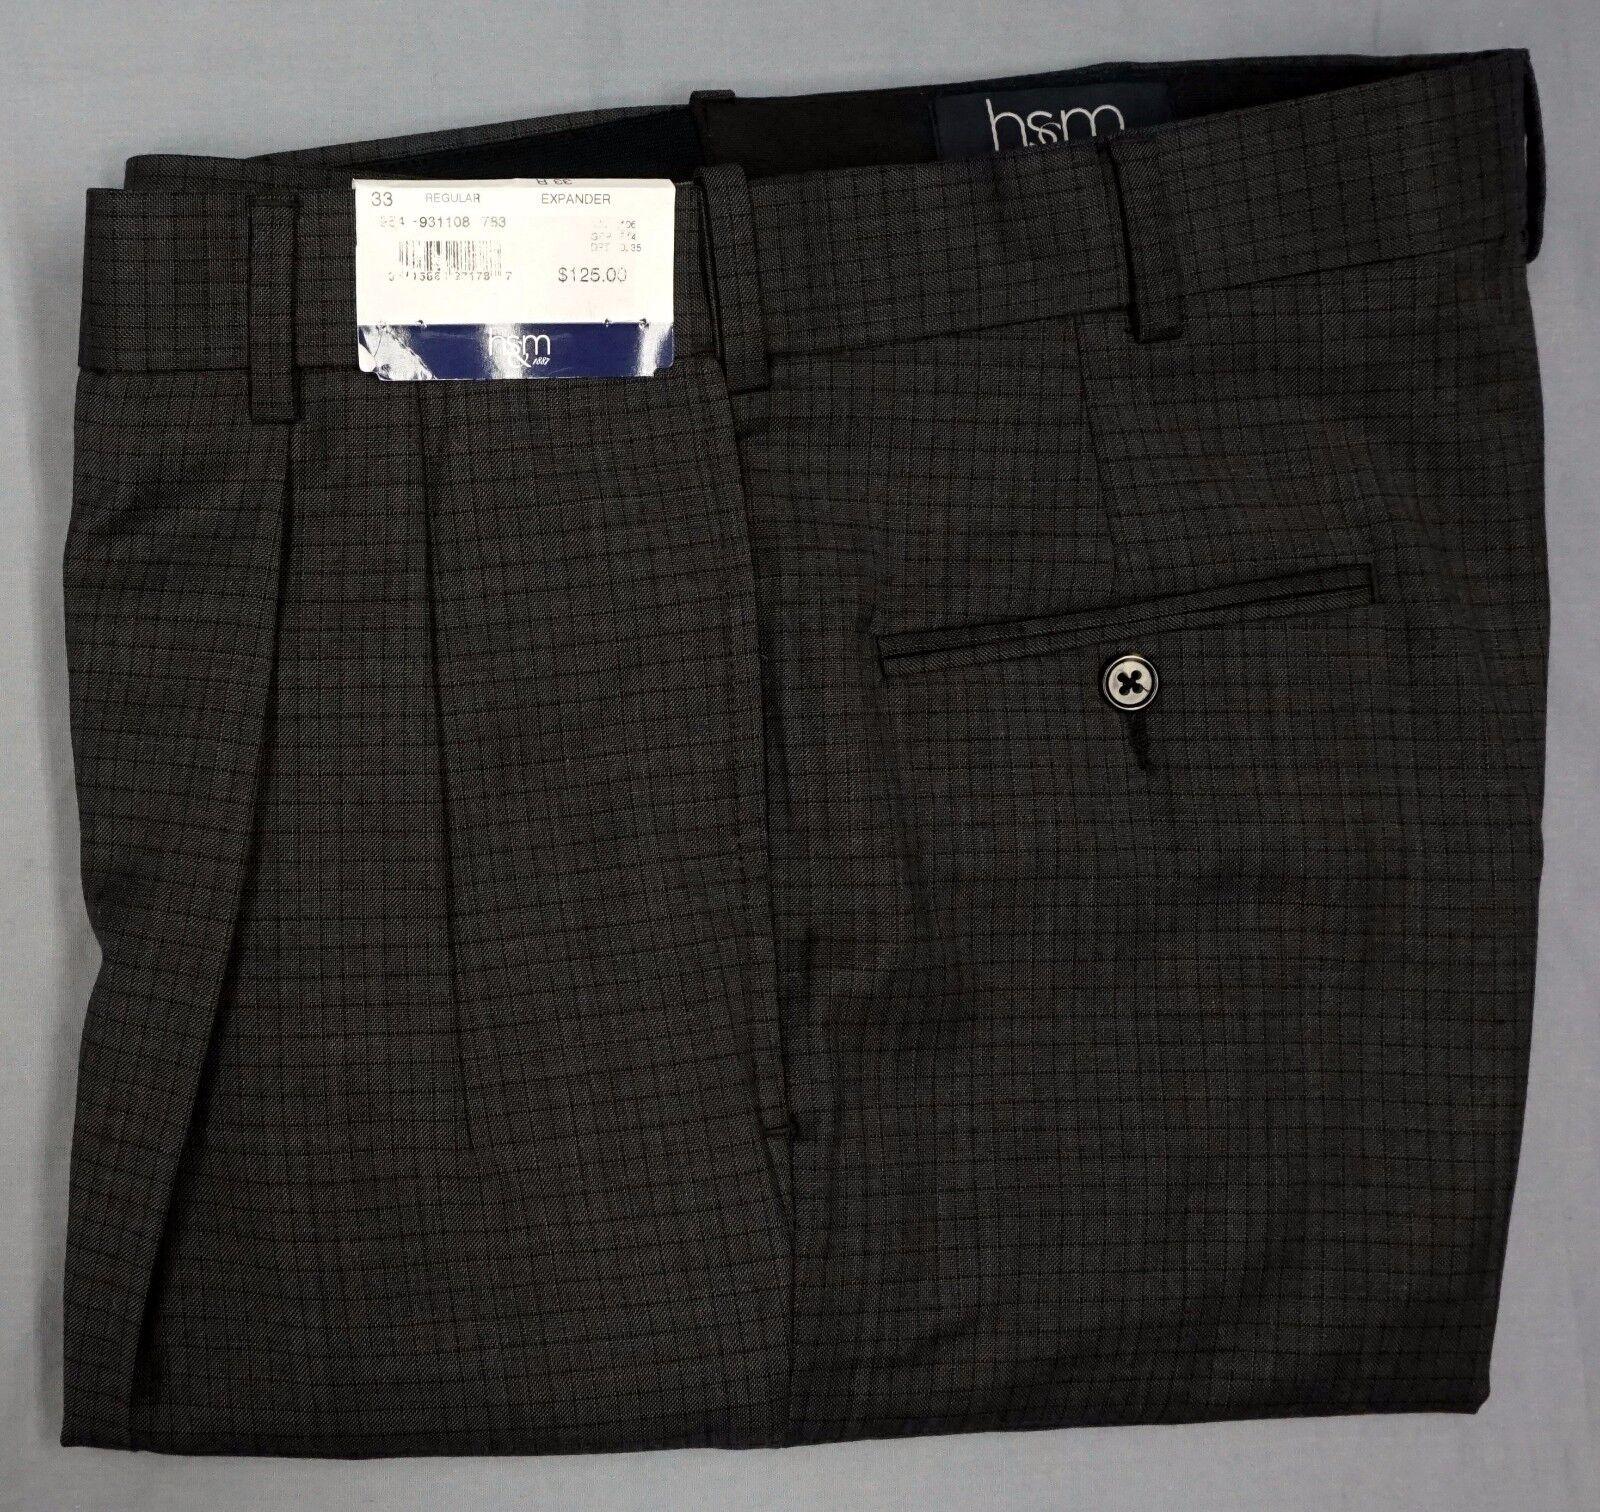 NWT  HART SCHAFFNER MARX GREY DRESS PANTS PLEAT EXPANDER 33R 34R 35R PLAID